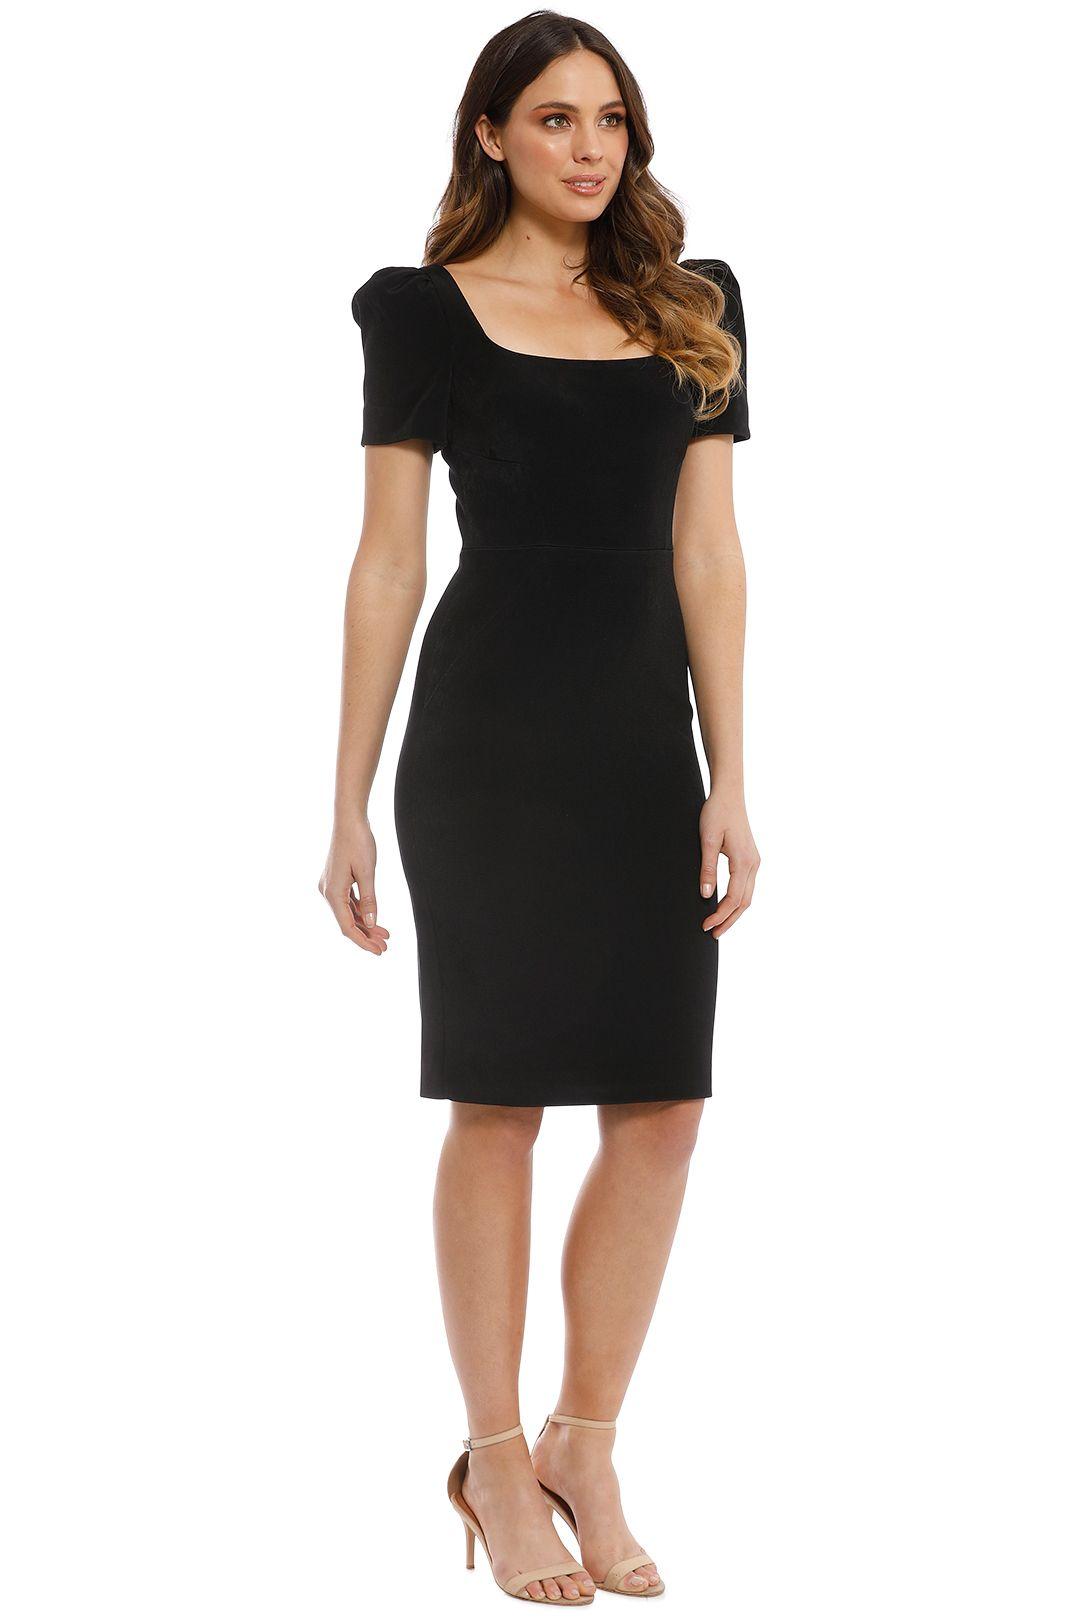 Rebecca Vallance - Ivy Dress - Black - Side